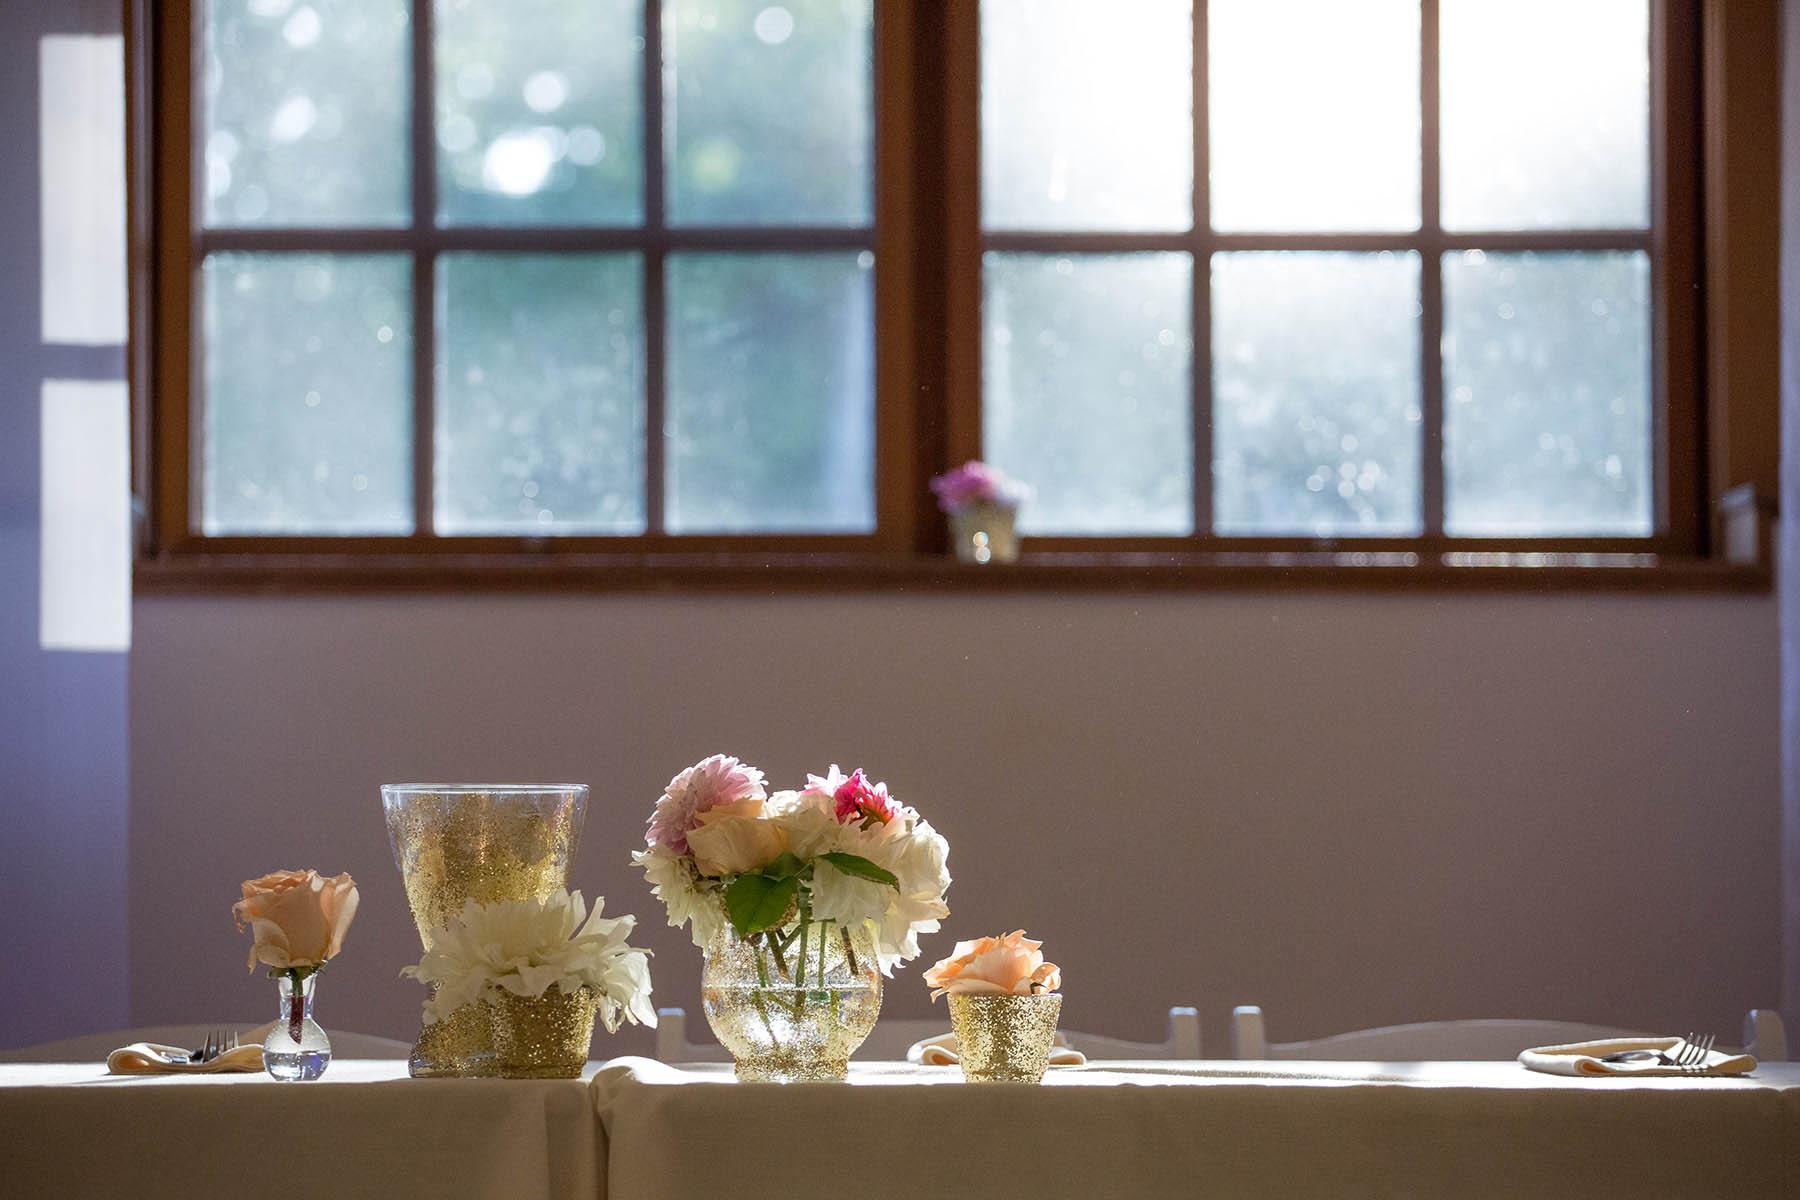 pickering-barn-issaquah-wedding-photography032.jpg